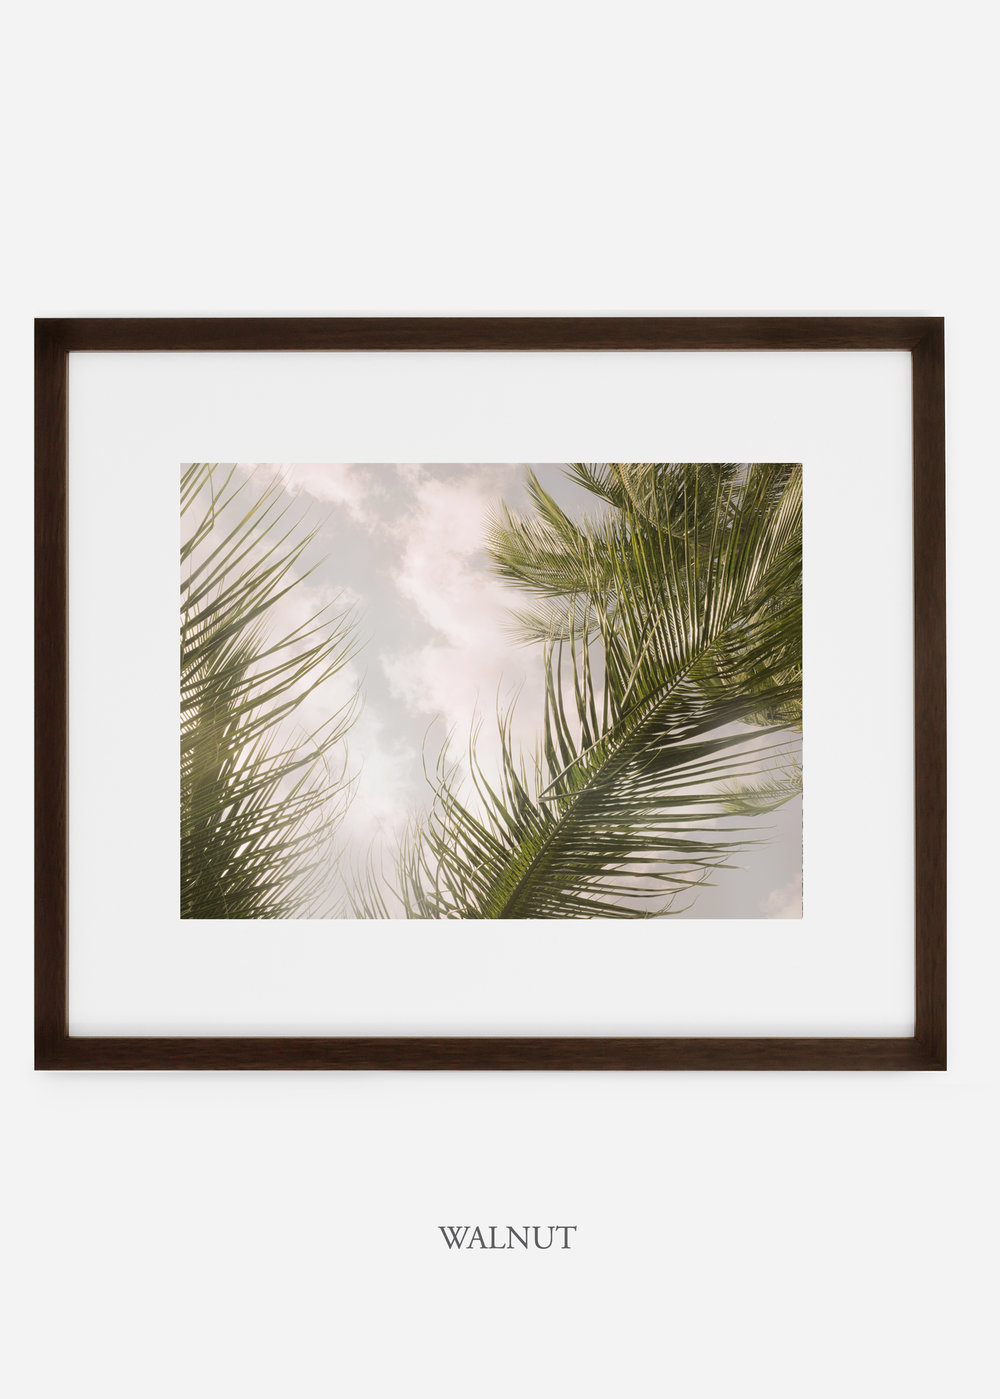 interiordesign_walnutframe_AiryPalmTreeNo.1_art_tropical_palmtree_StormyGrayPalm.jpg